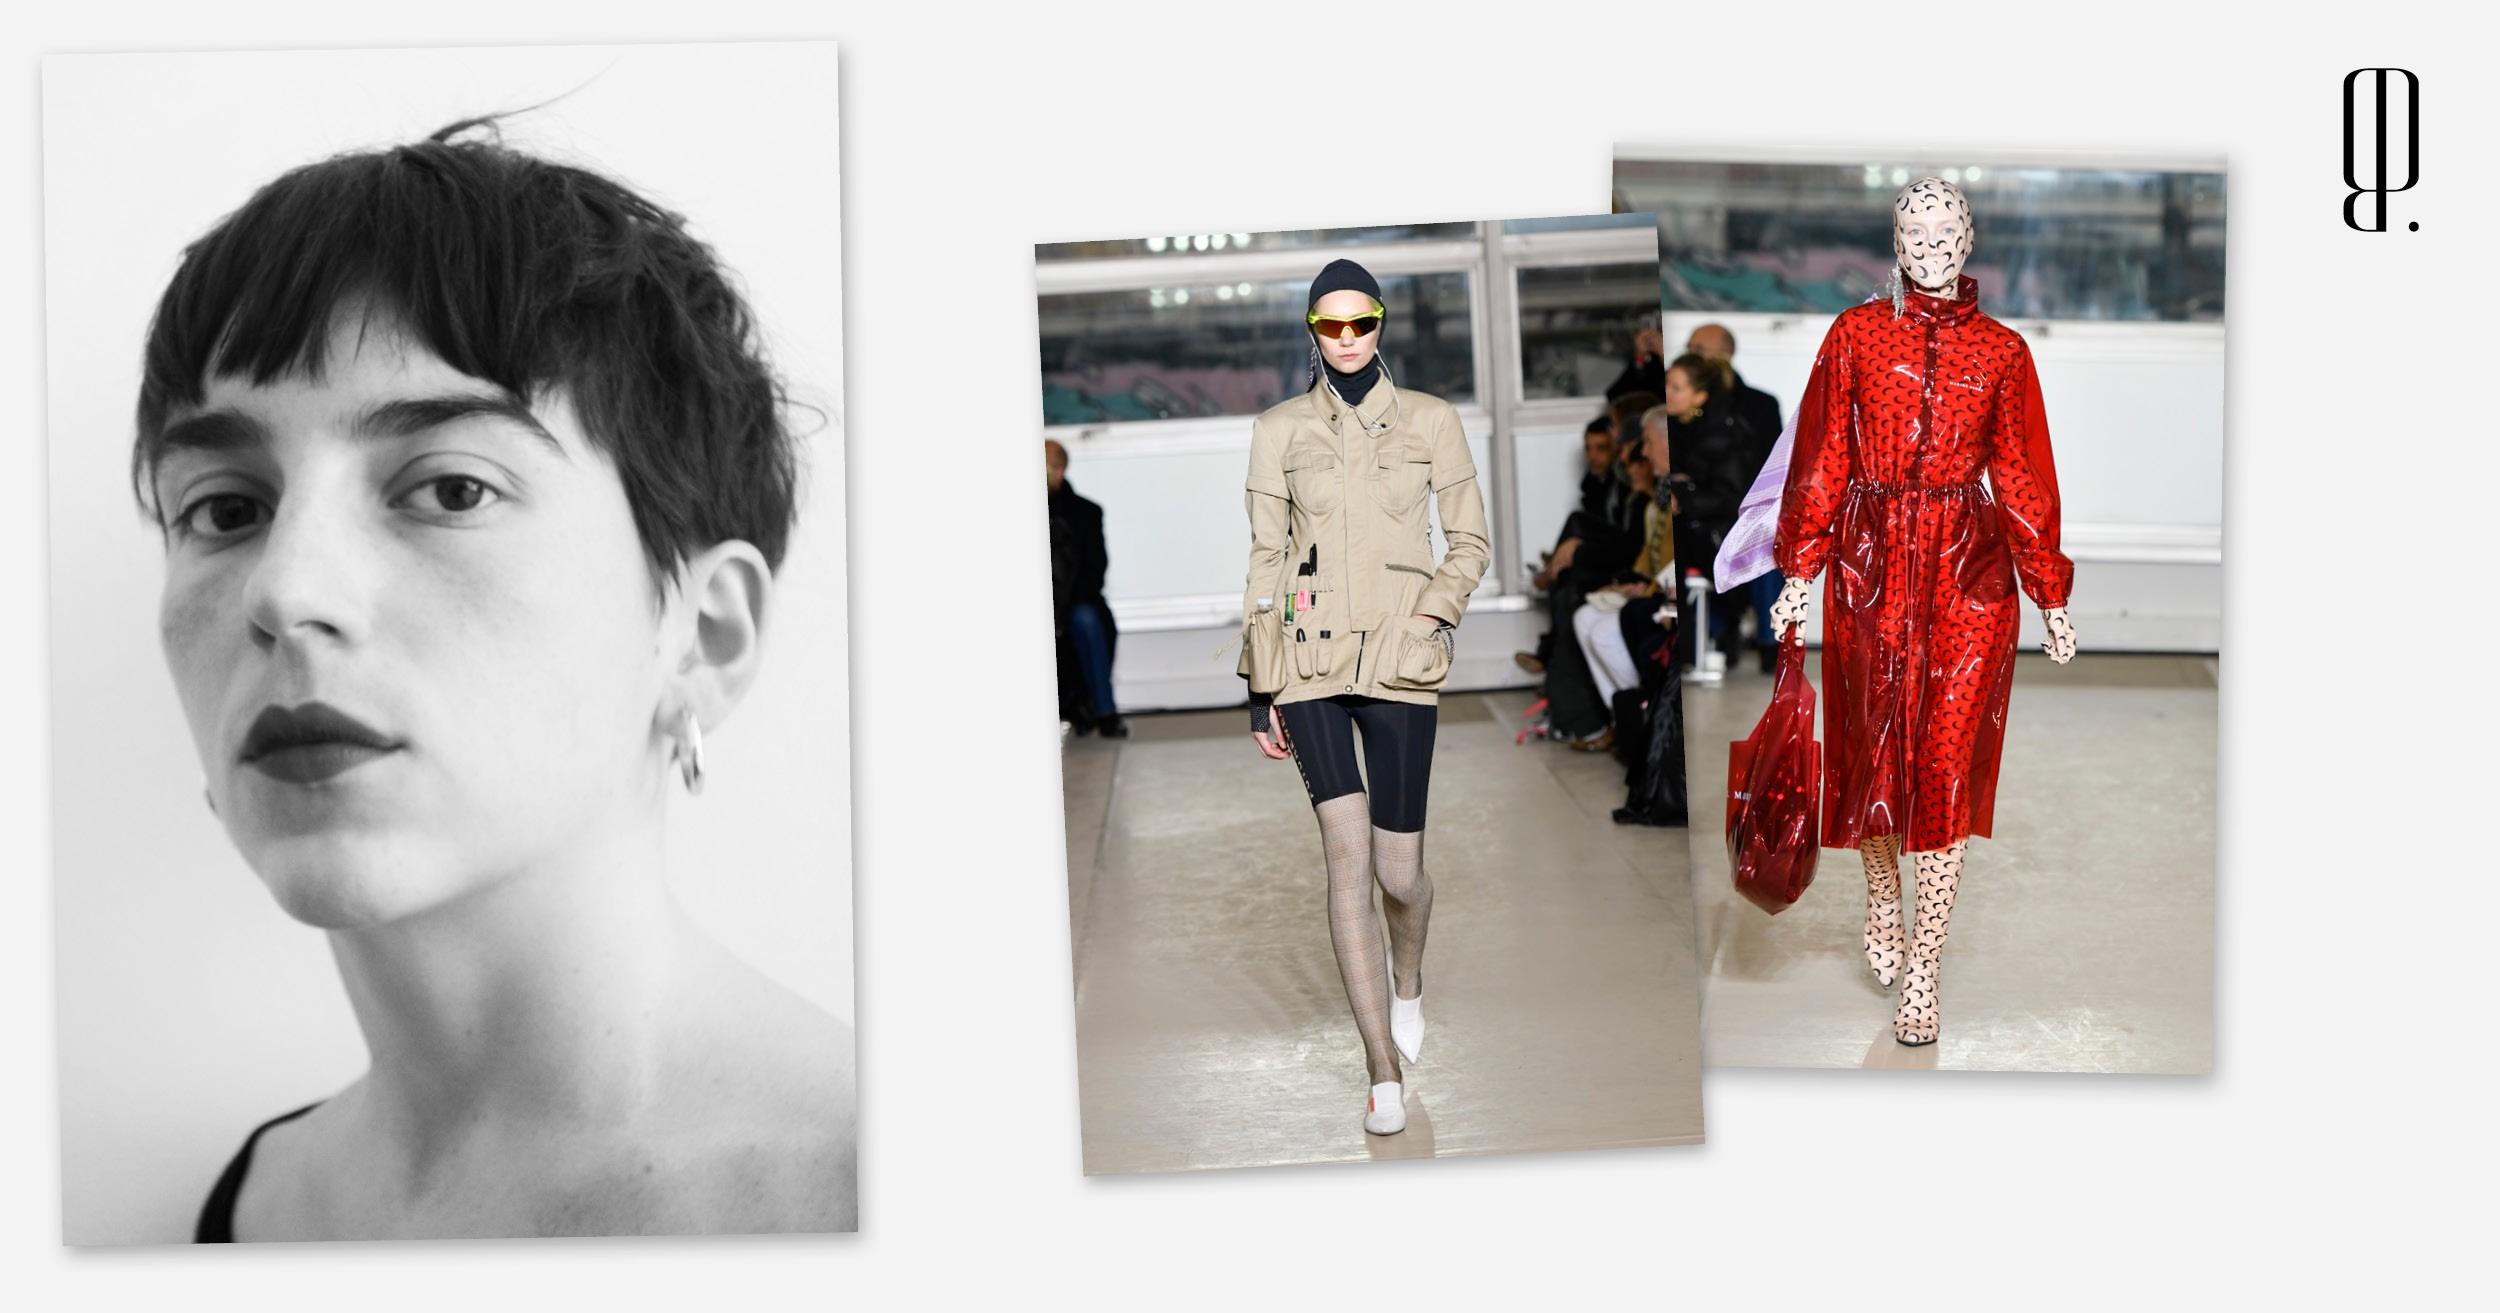 https://theblueprint.ru/fashion/marine-serre